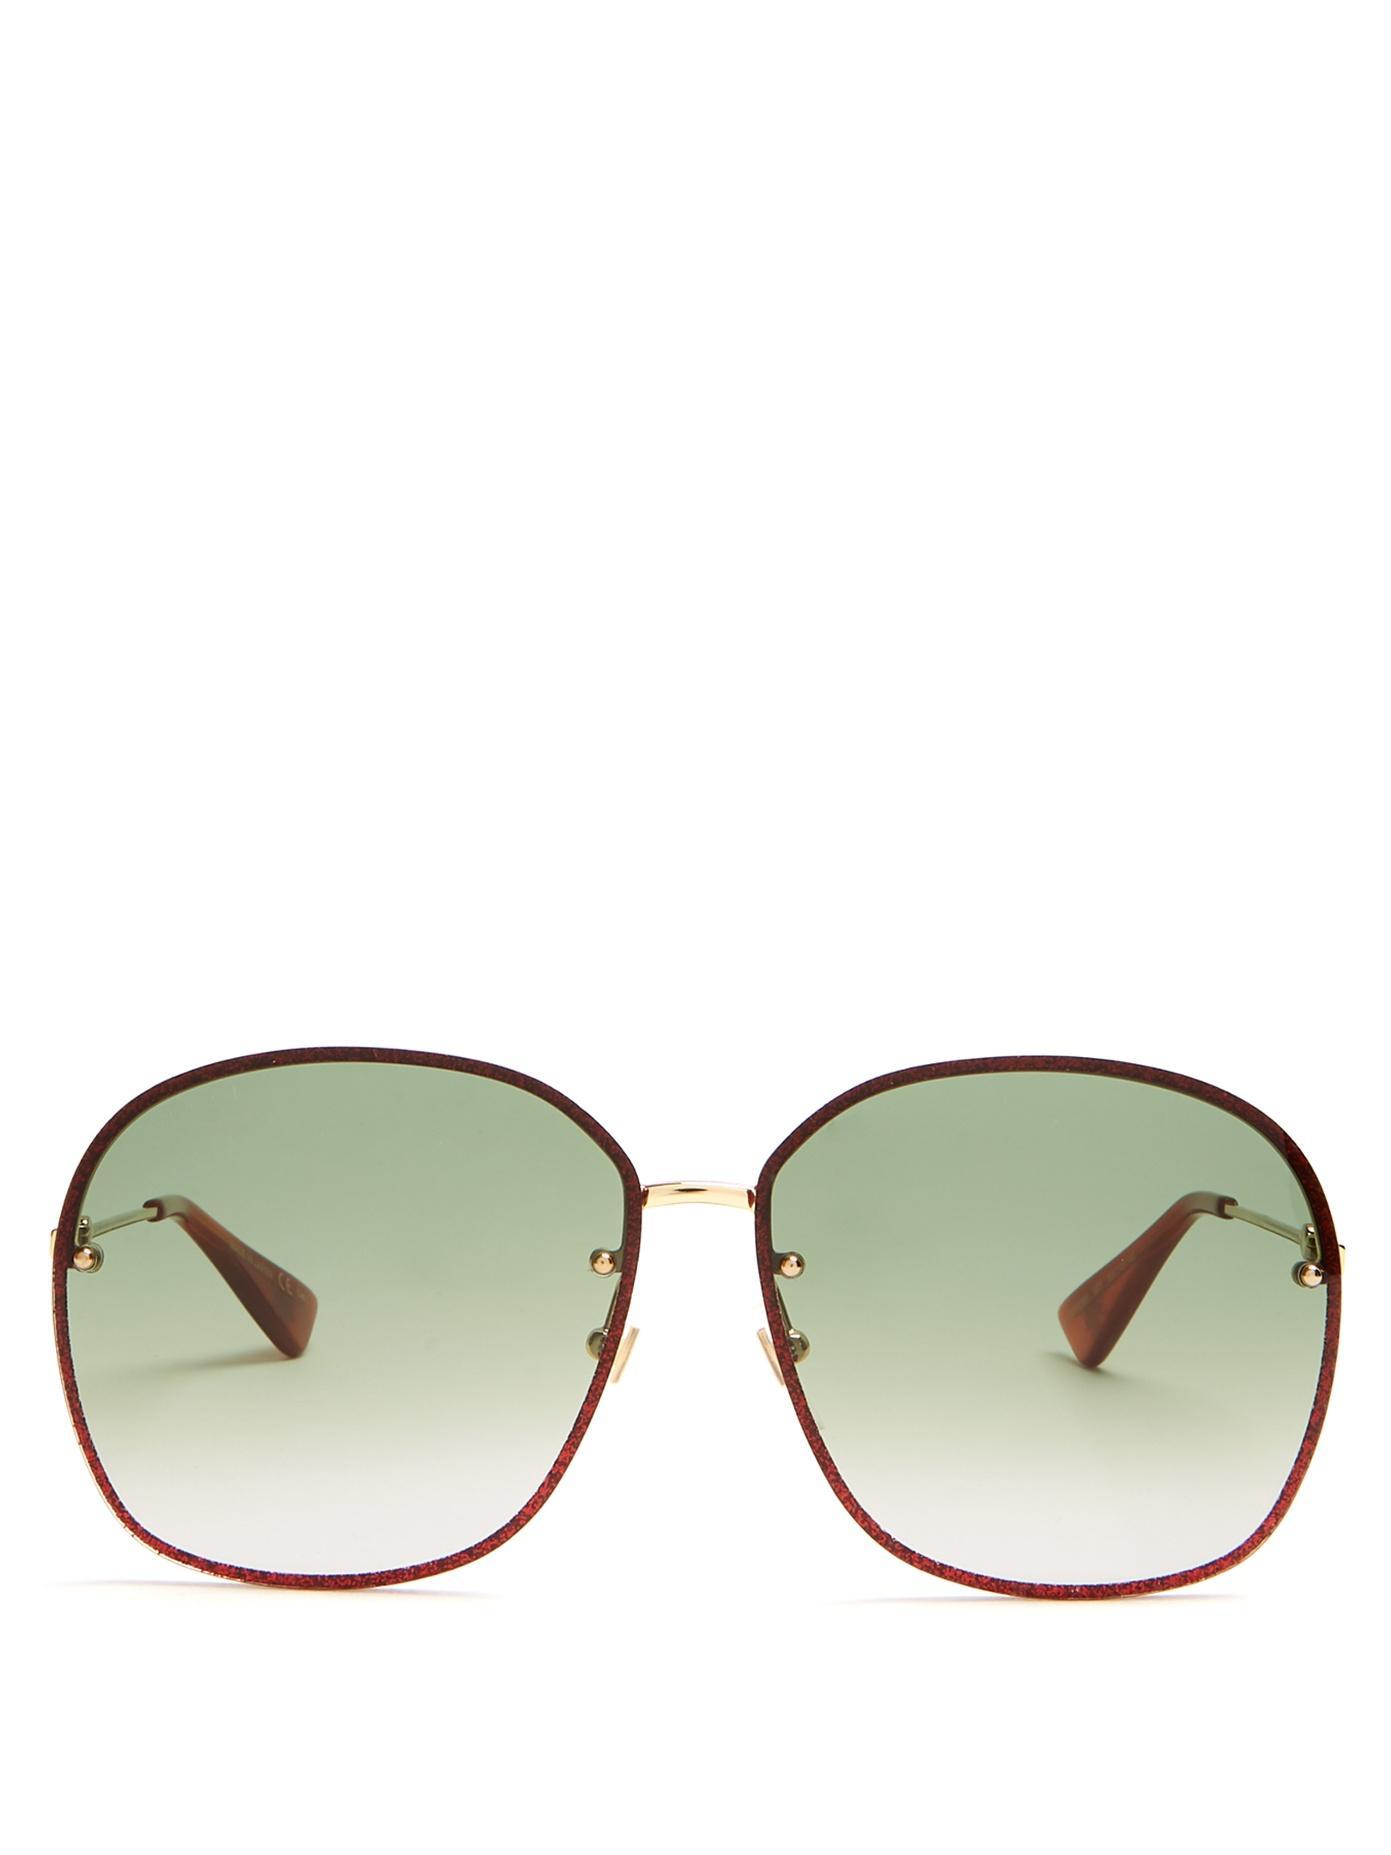 Gucci Glitter-Embellished Sunglasses In Gold Multi